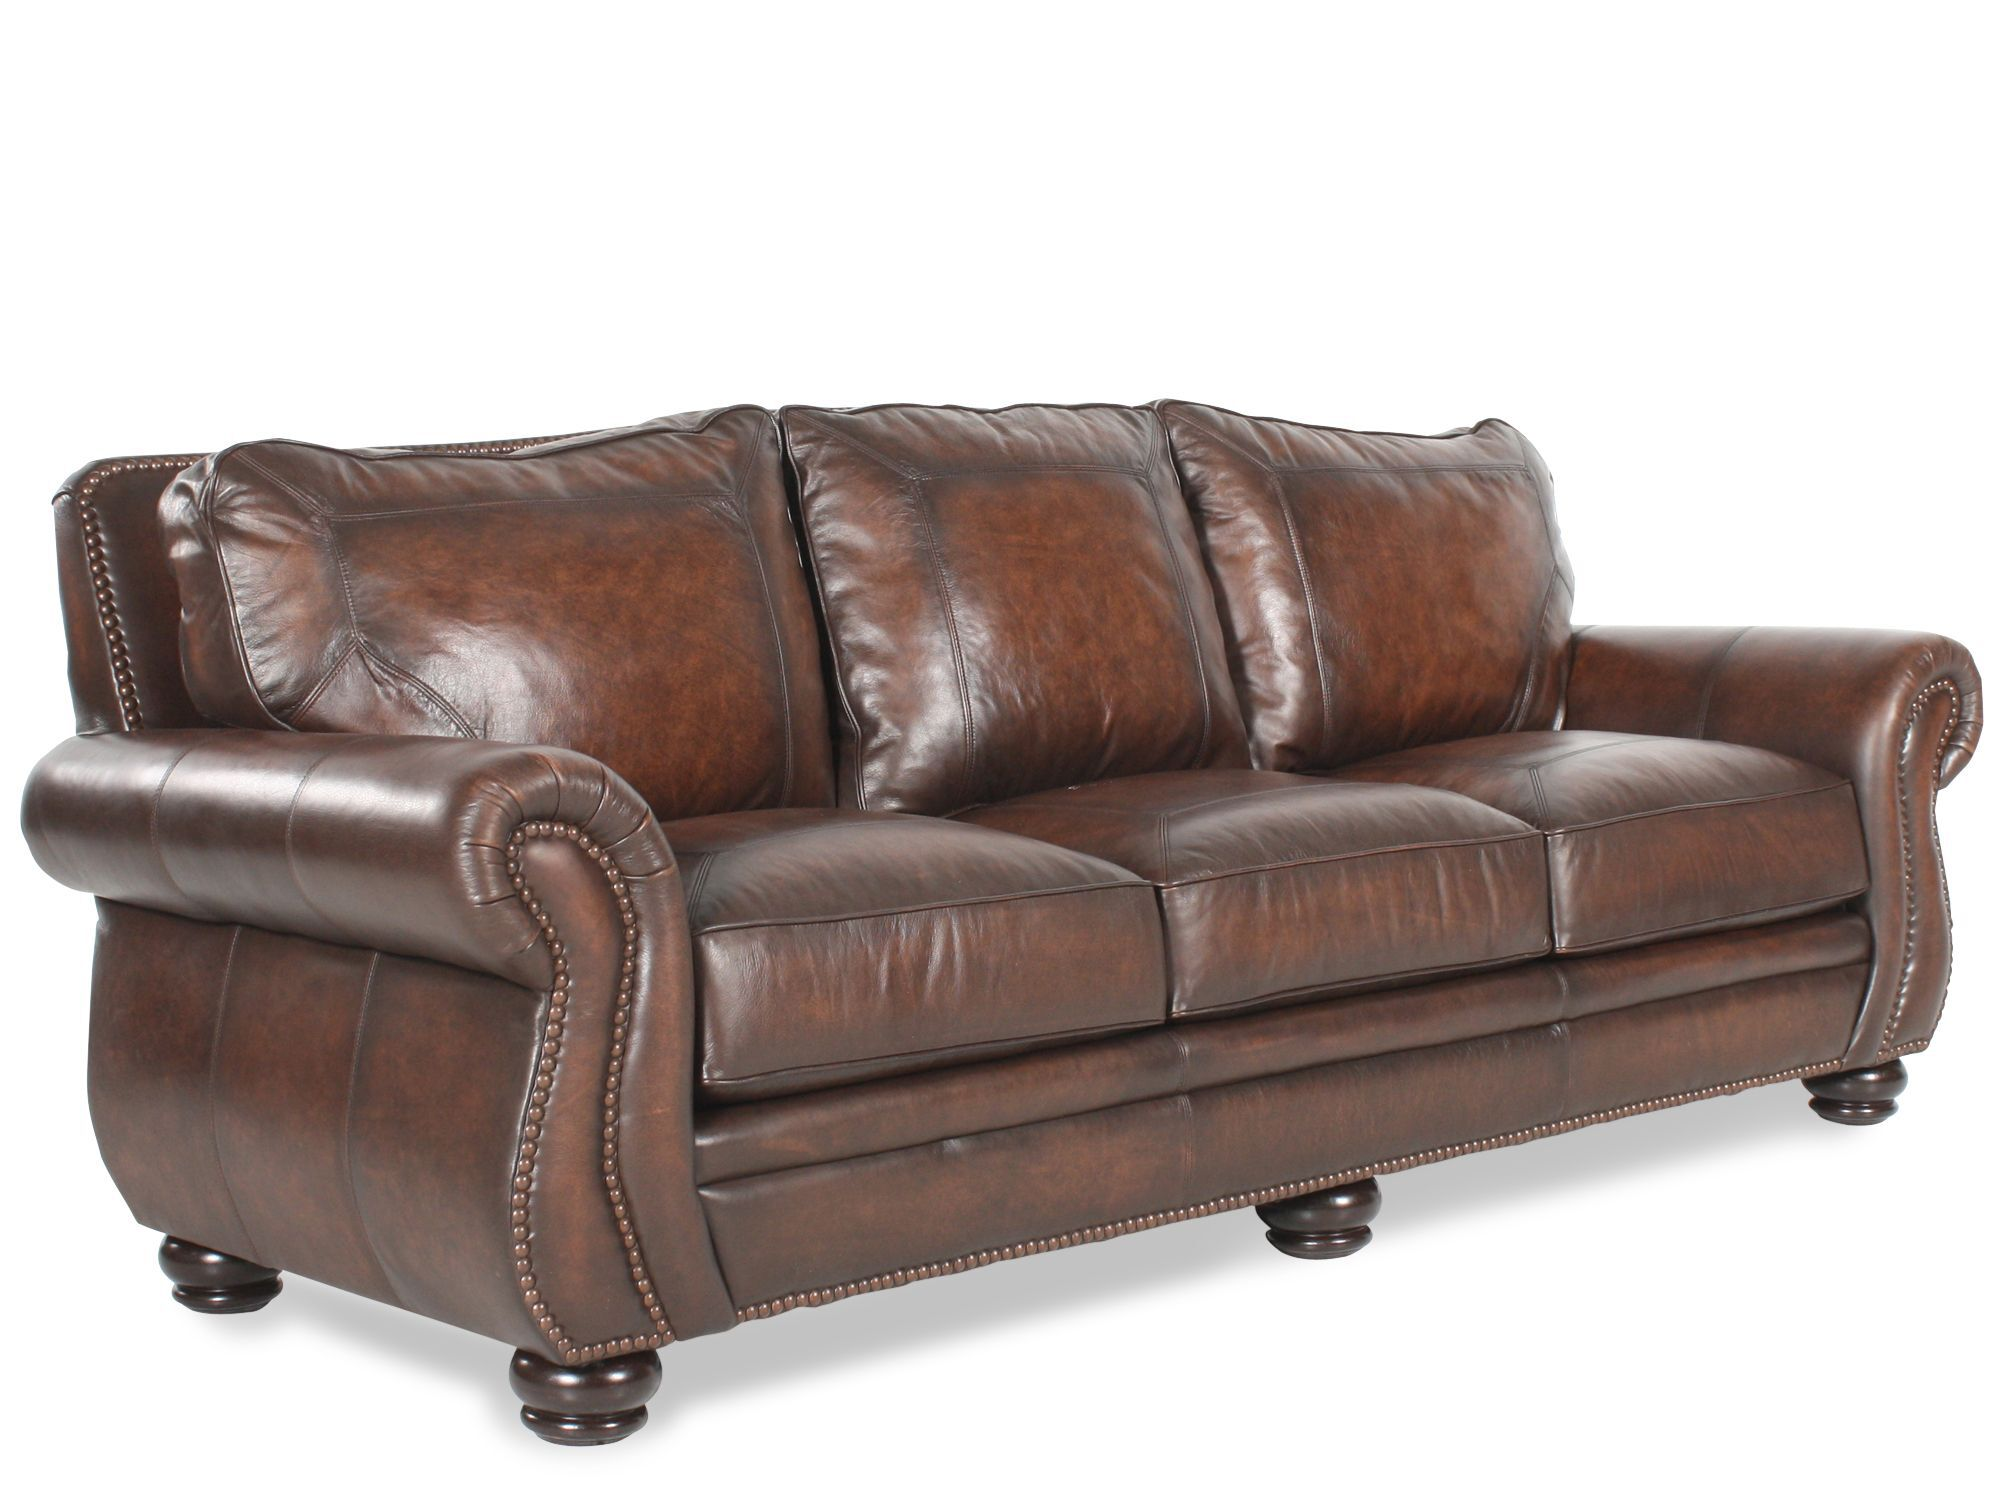 Bernhardt Breckenridge Leather Sofa · Bernhardt Breckenridge Leather Sofa  ...